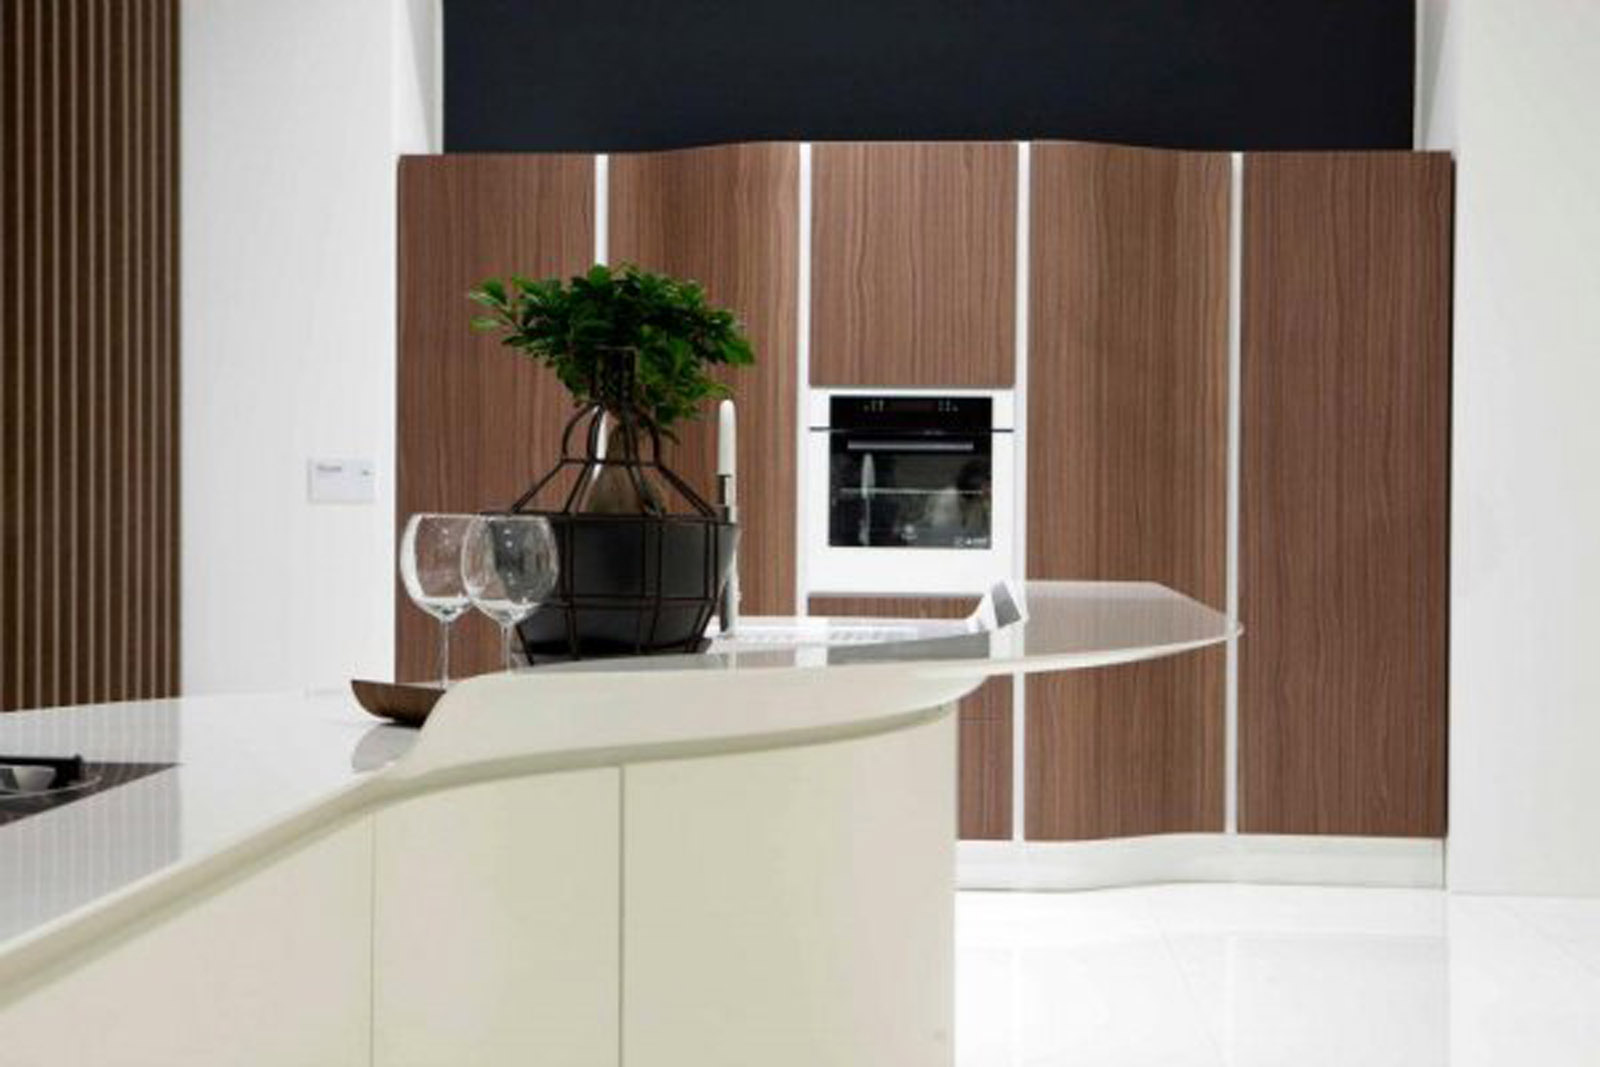 Come arredare la cucina moderna novit 2015 catania for Arredare la cucina